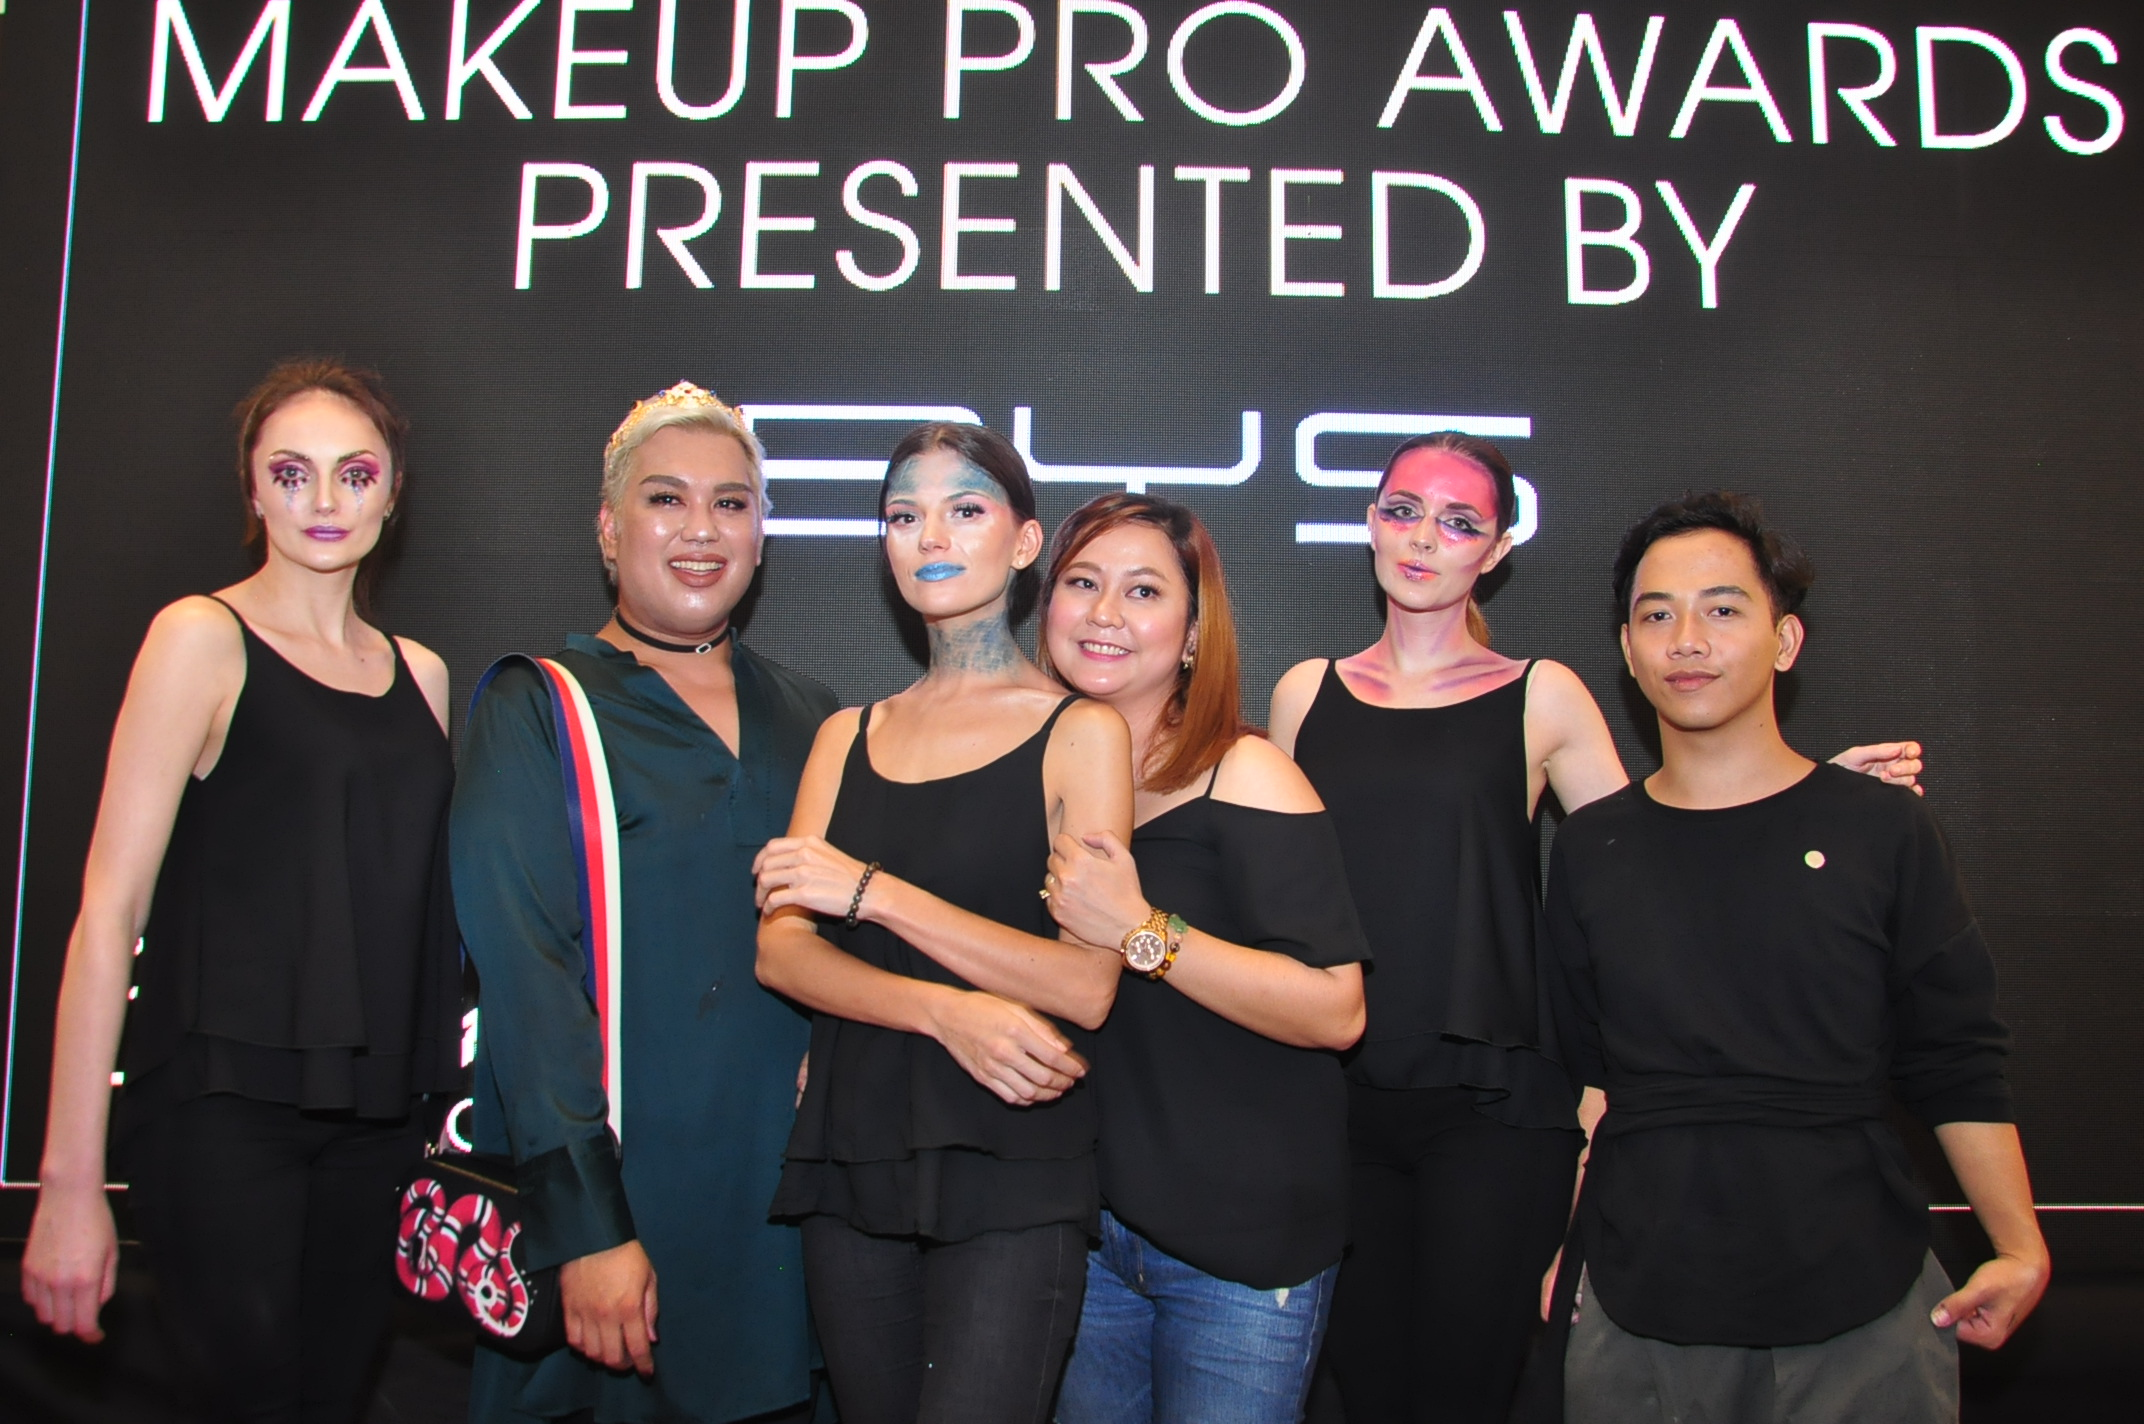 Model Irina Zinchenko with makeup artist Nap Candelaria, Model Alla Alla with makeup artist Muriel Jada Nubla, and Model Sandra Ma with makeup artist Zidjian Floro